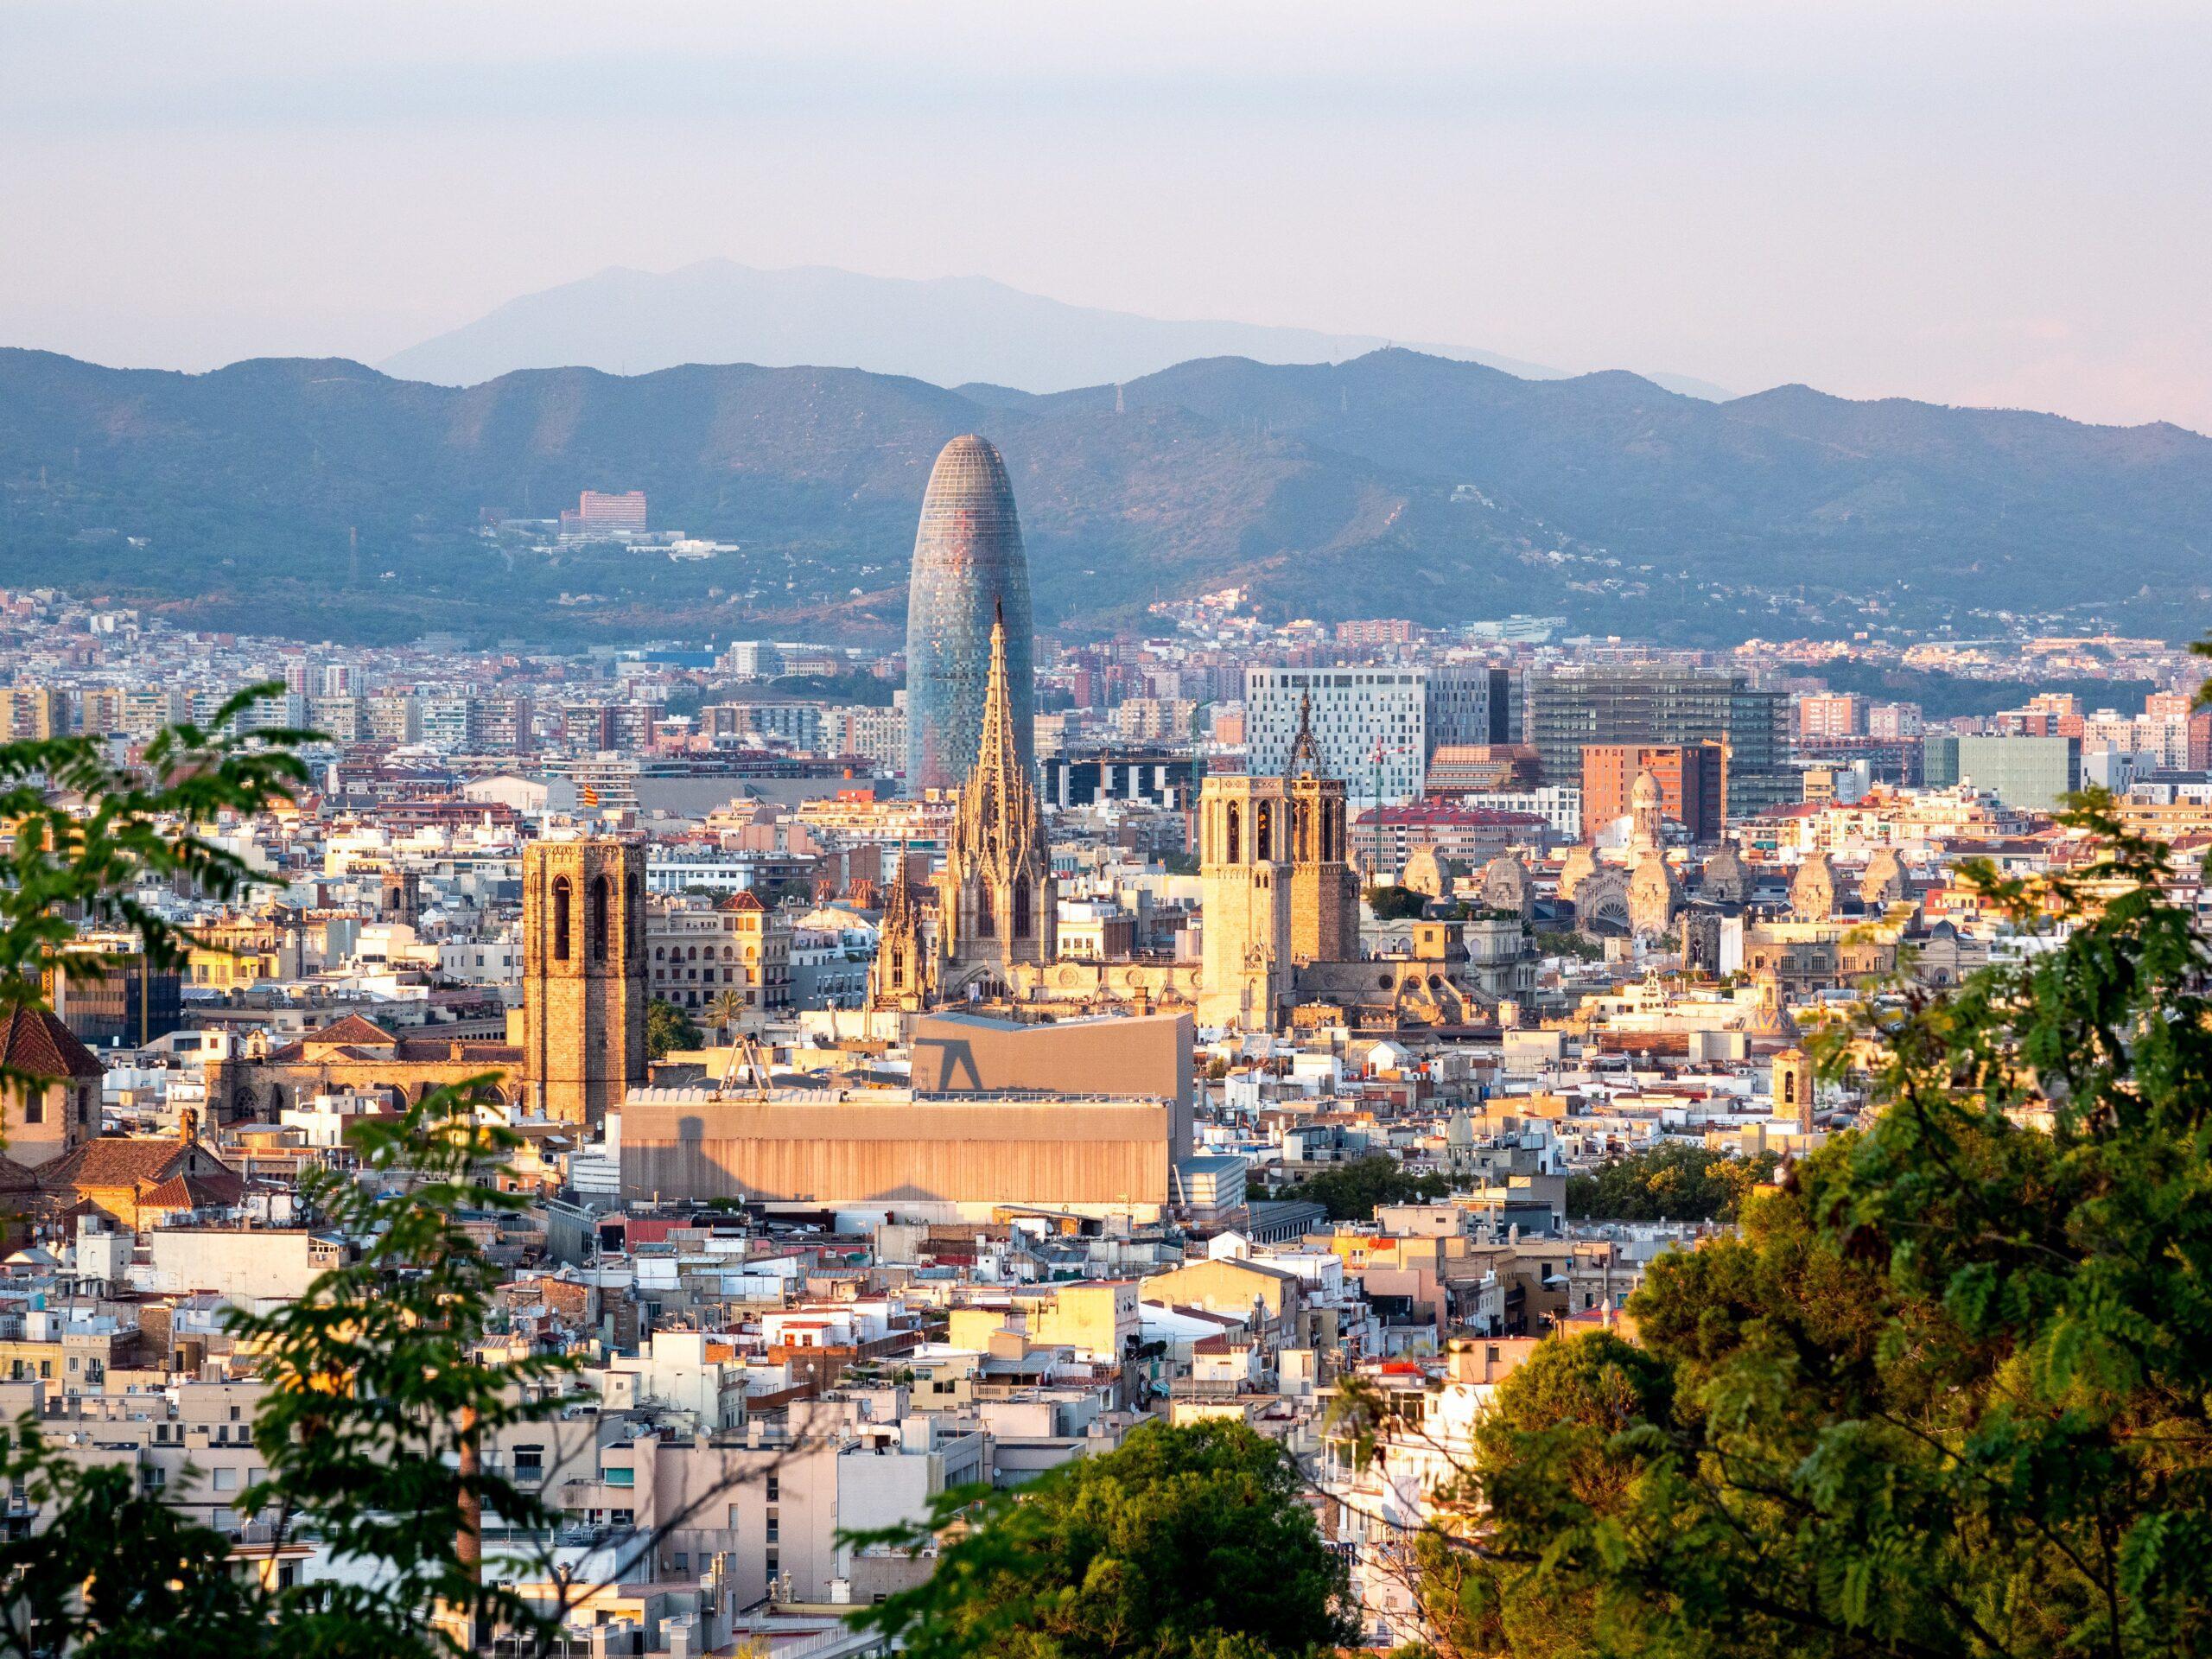 dimitry-anikin-View of Barcelona from high vista-unsplash